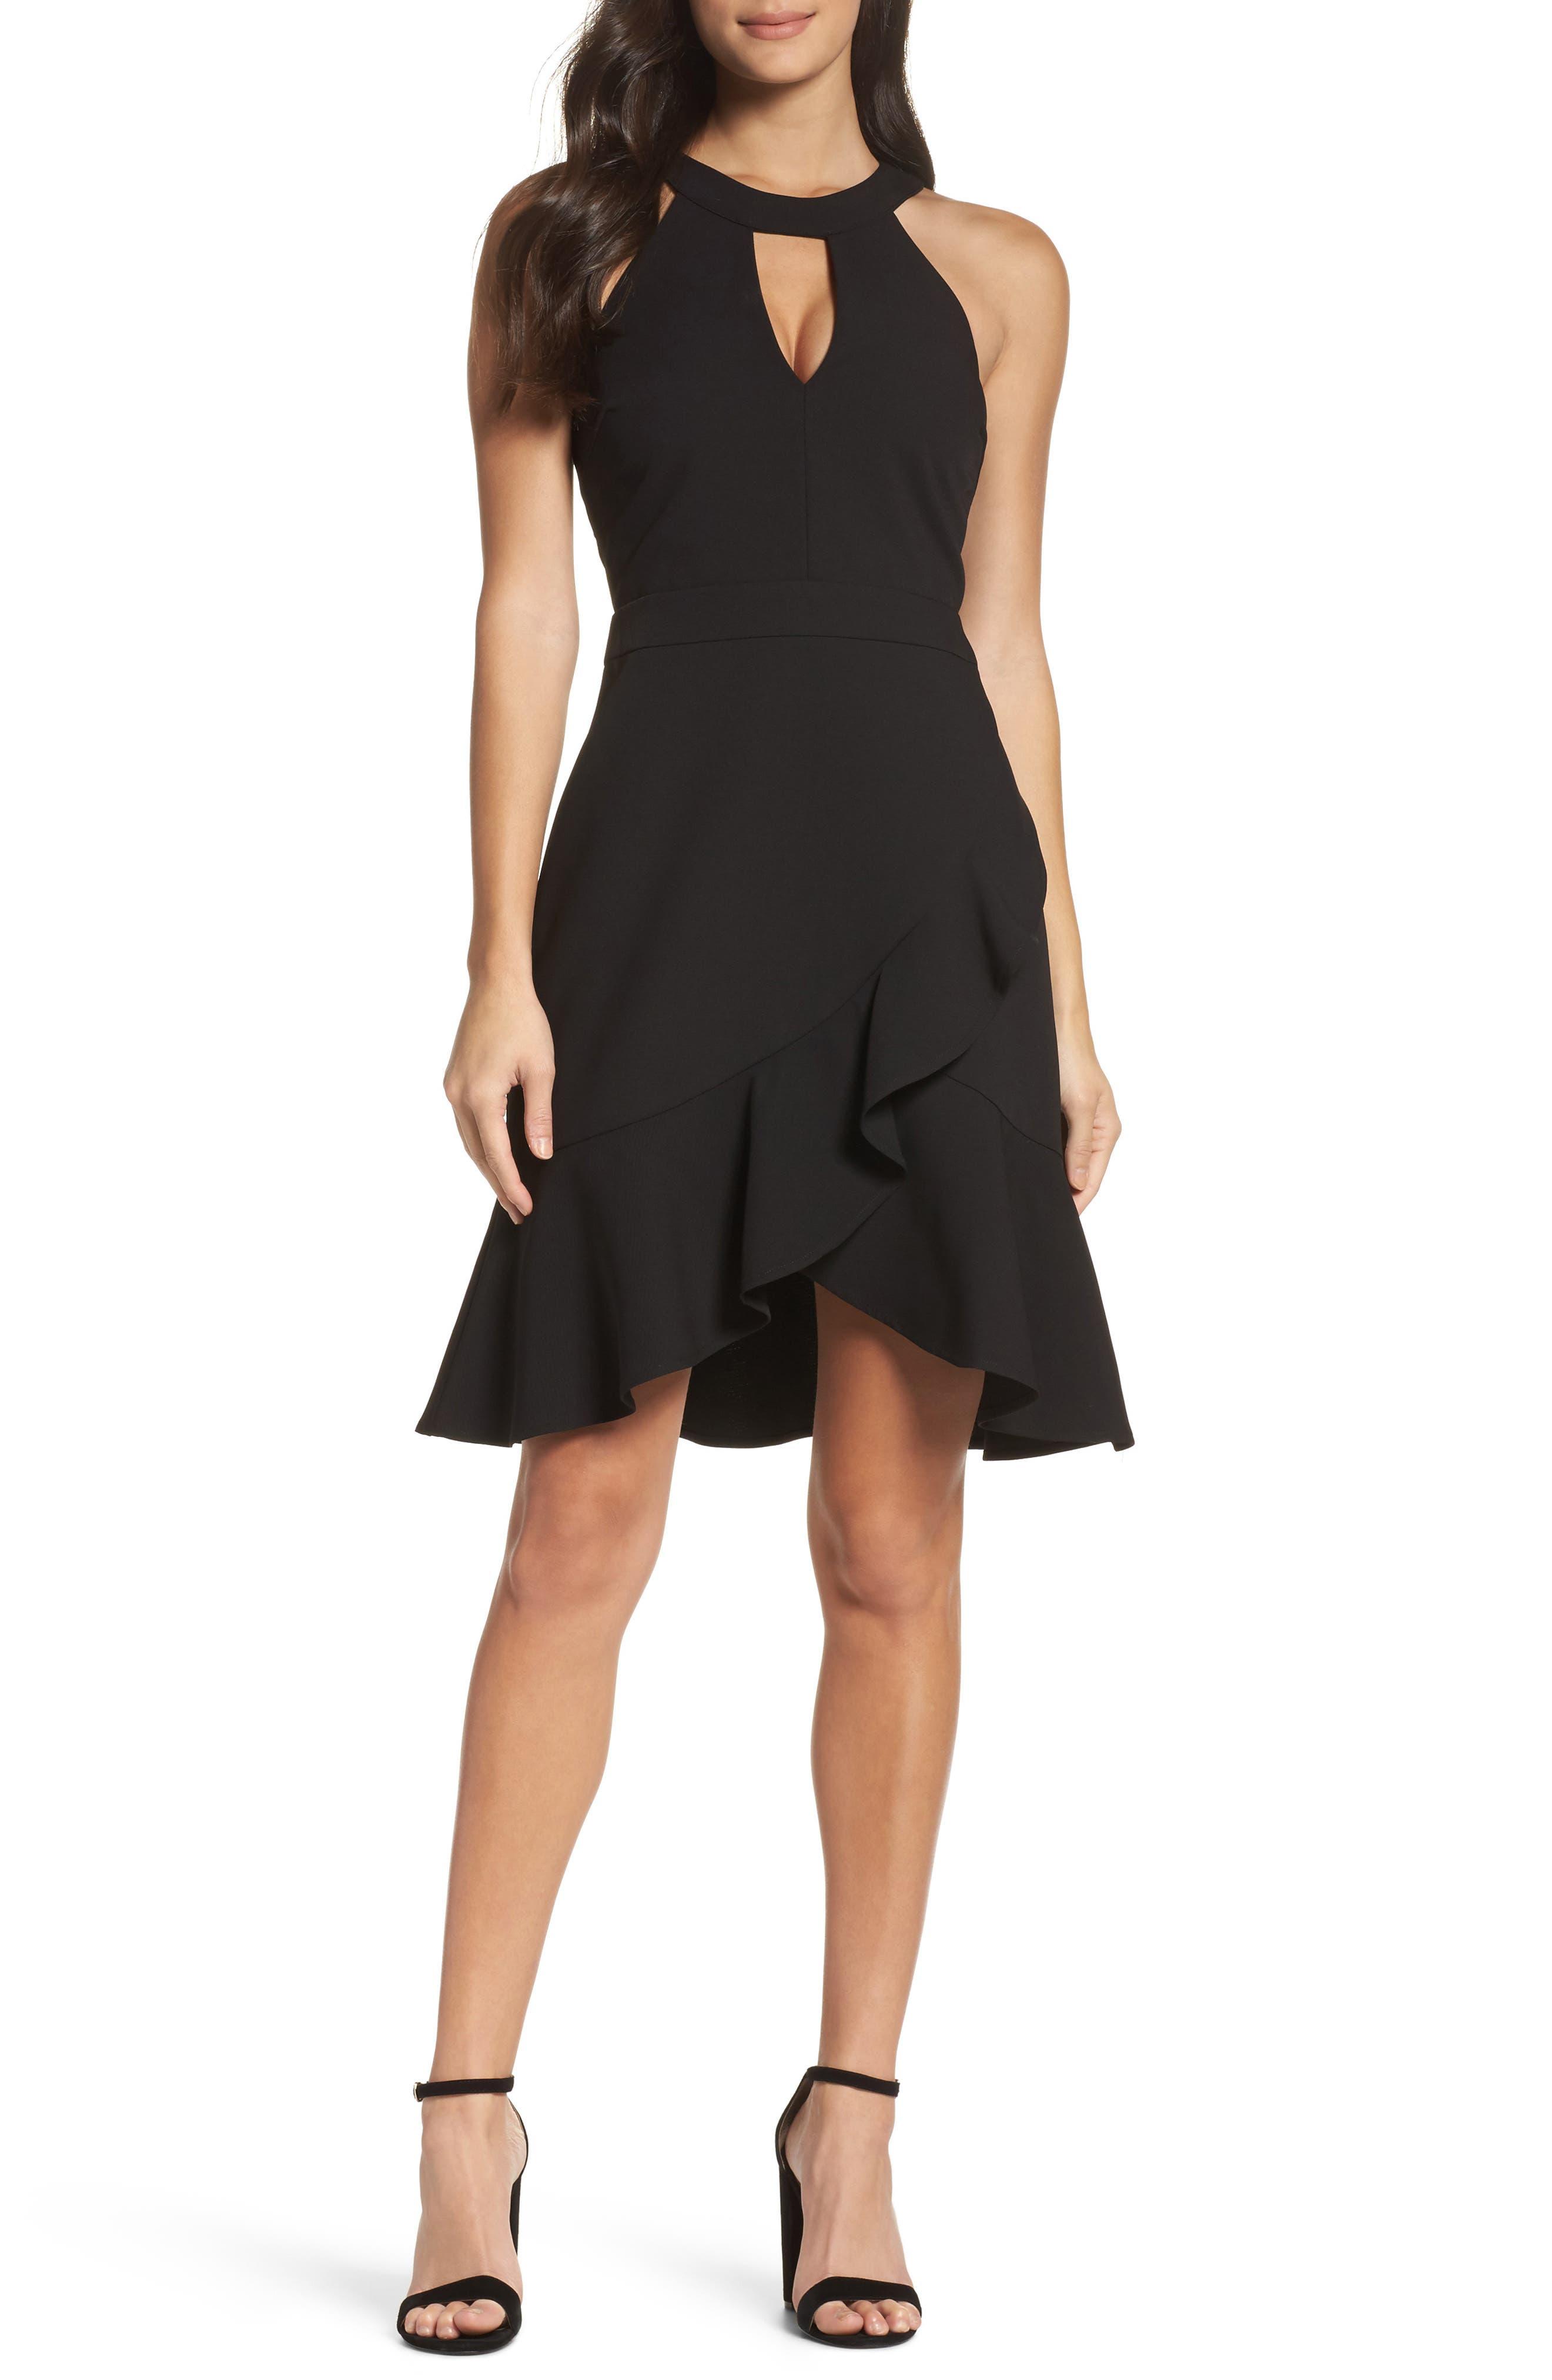 Main Image - Adelyn Rae Kasi Ruffle Fit & Flare Dress